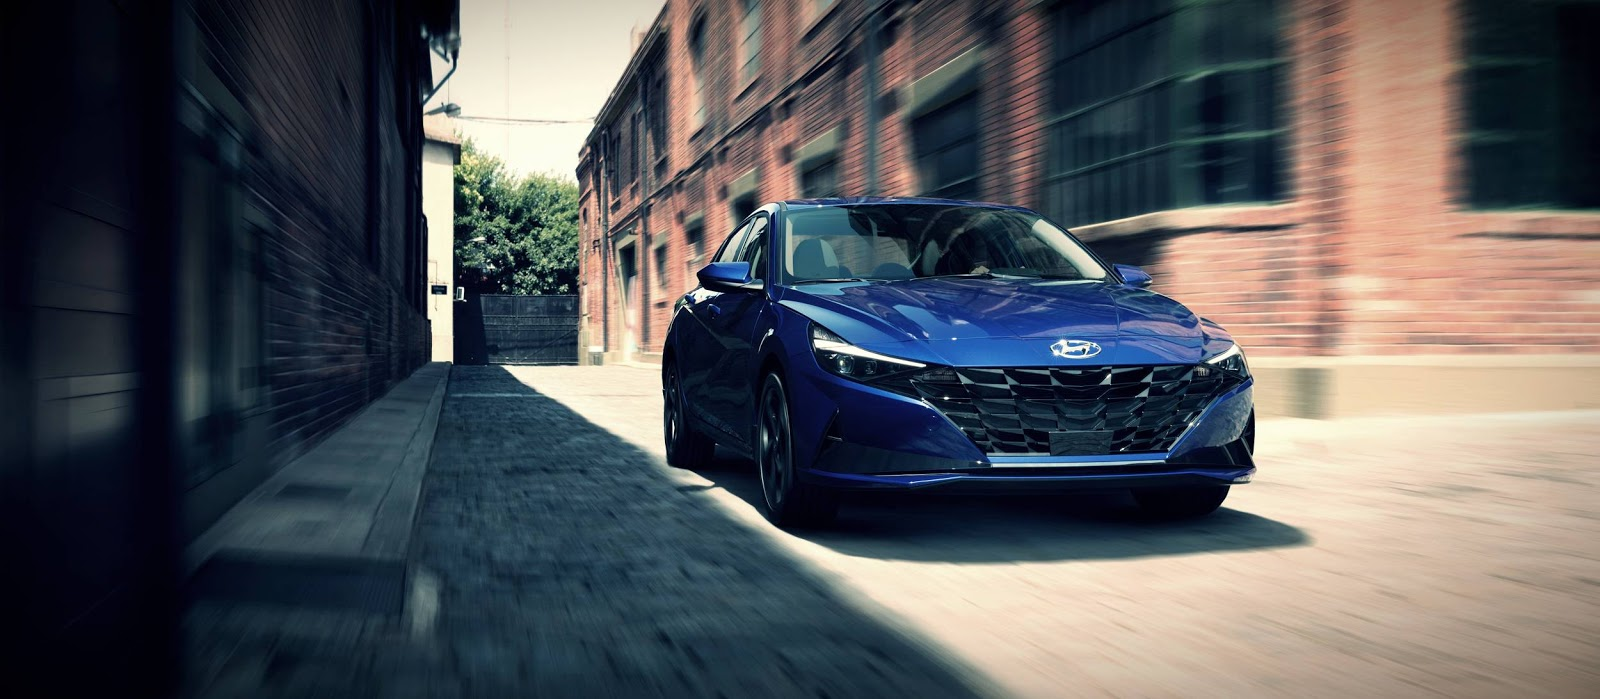 Introduced the new Hyundai Elantra: